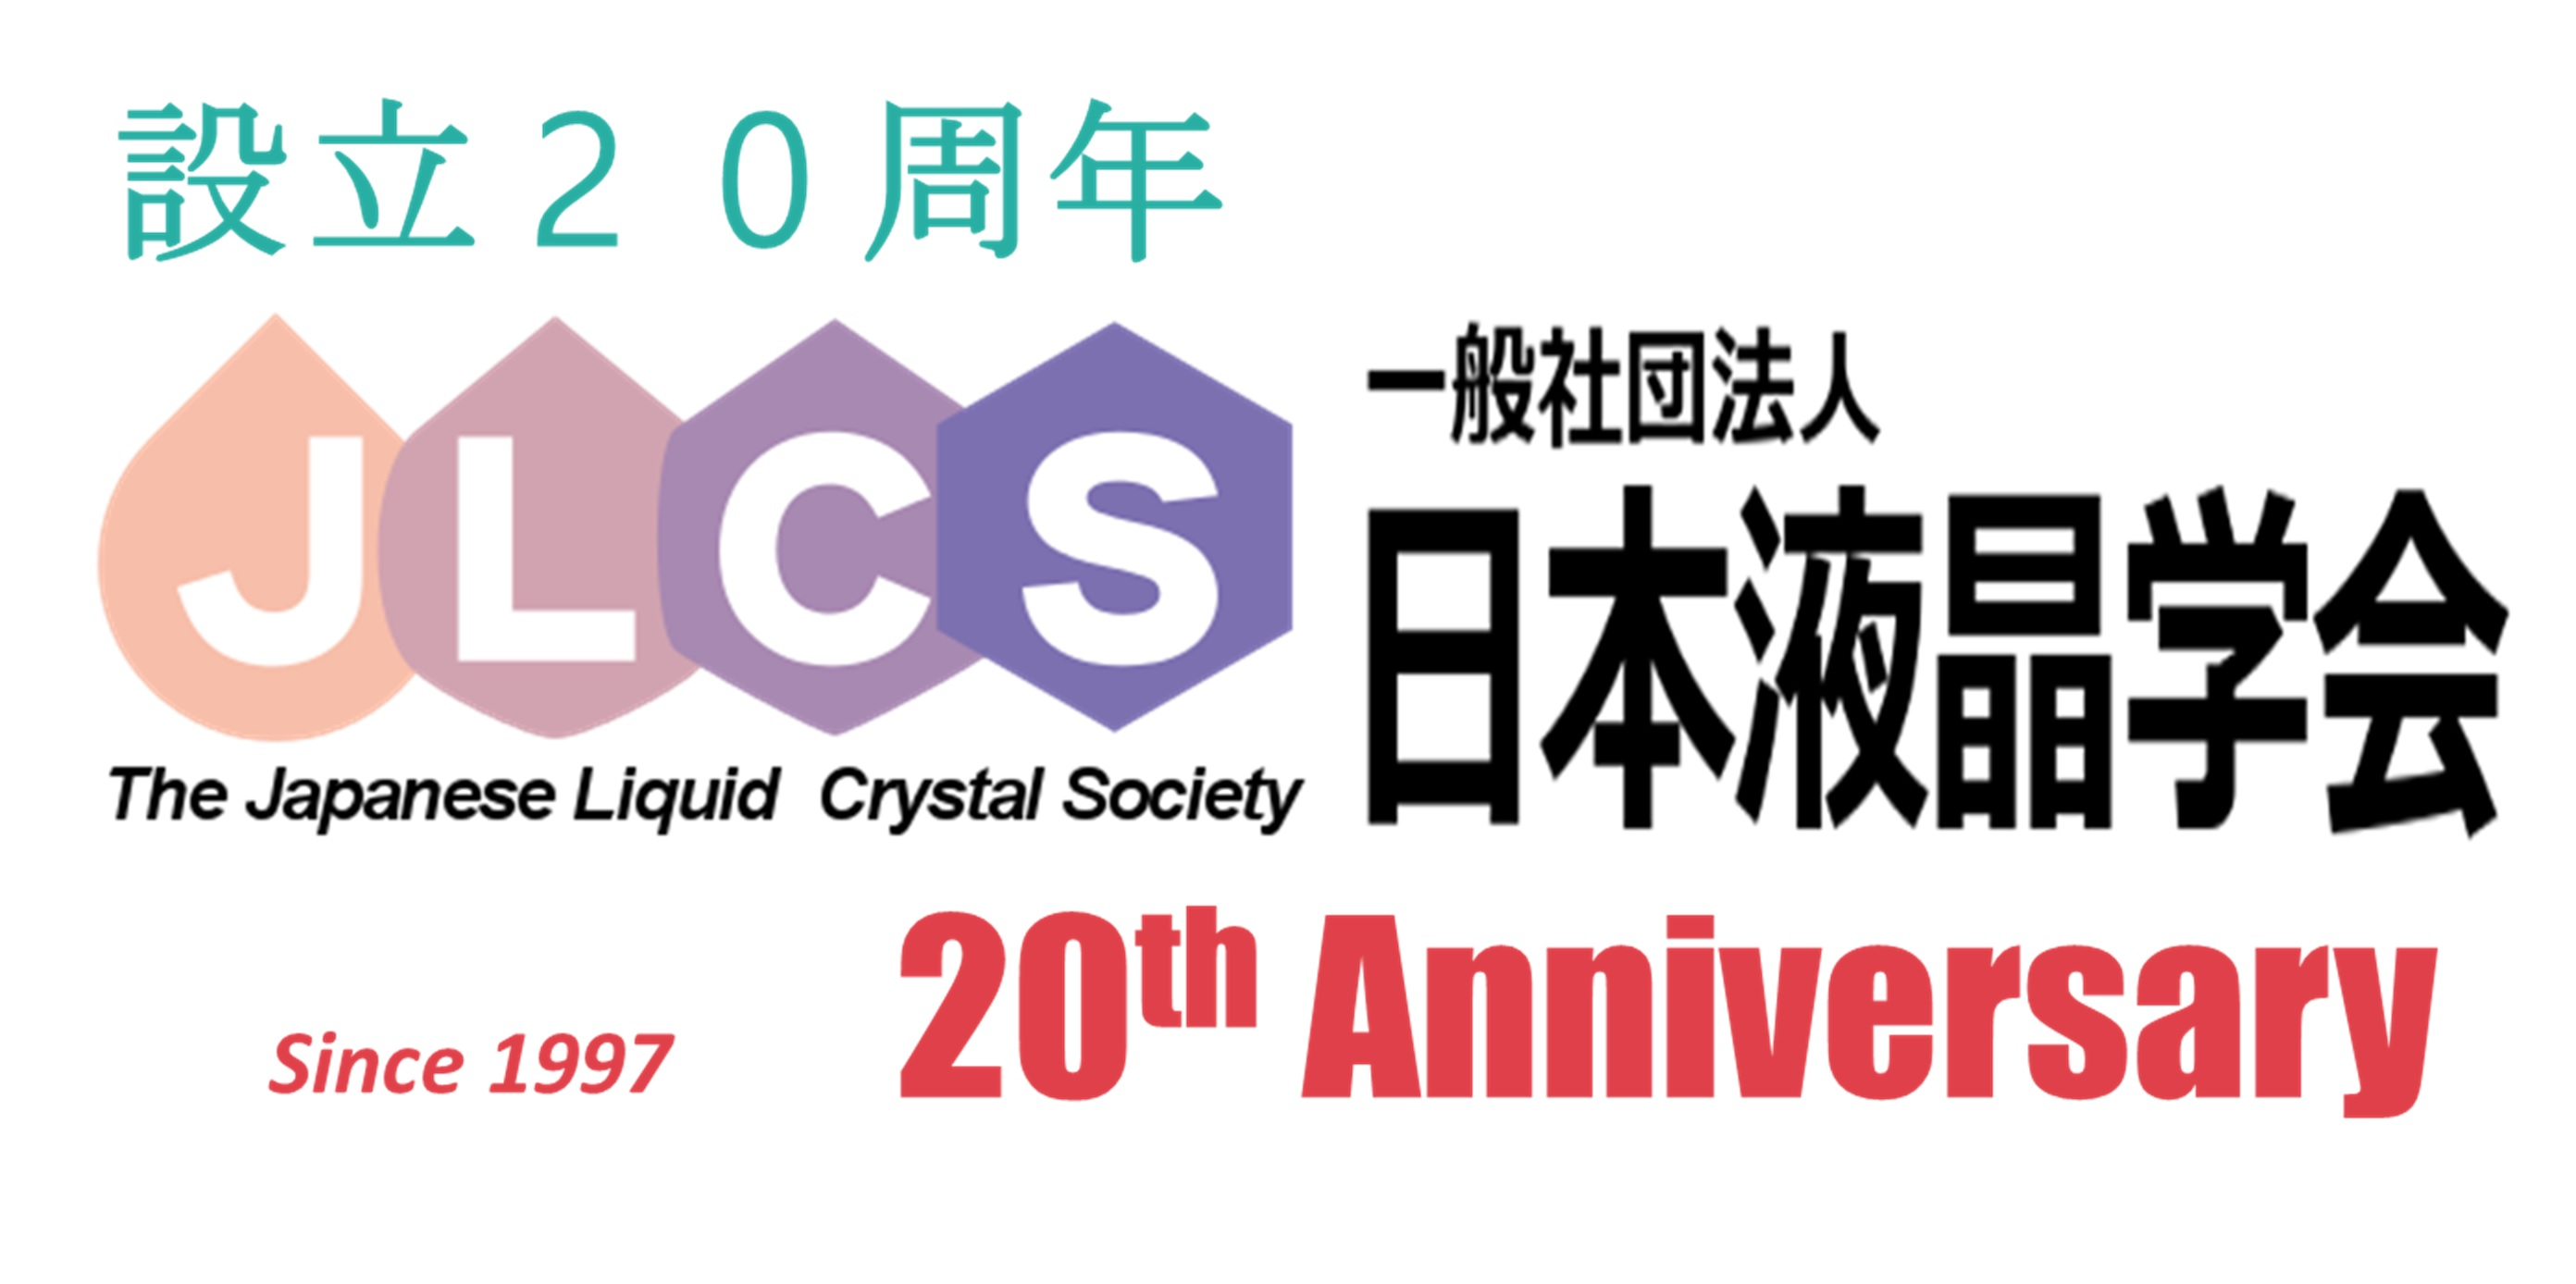 JLCS 20th Anniversary